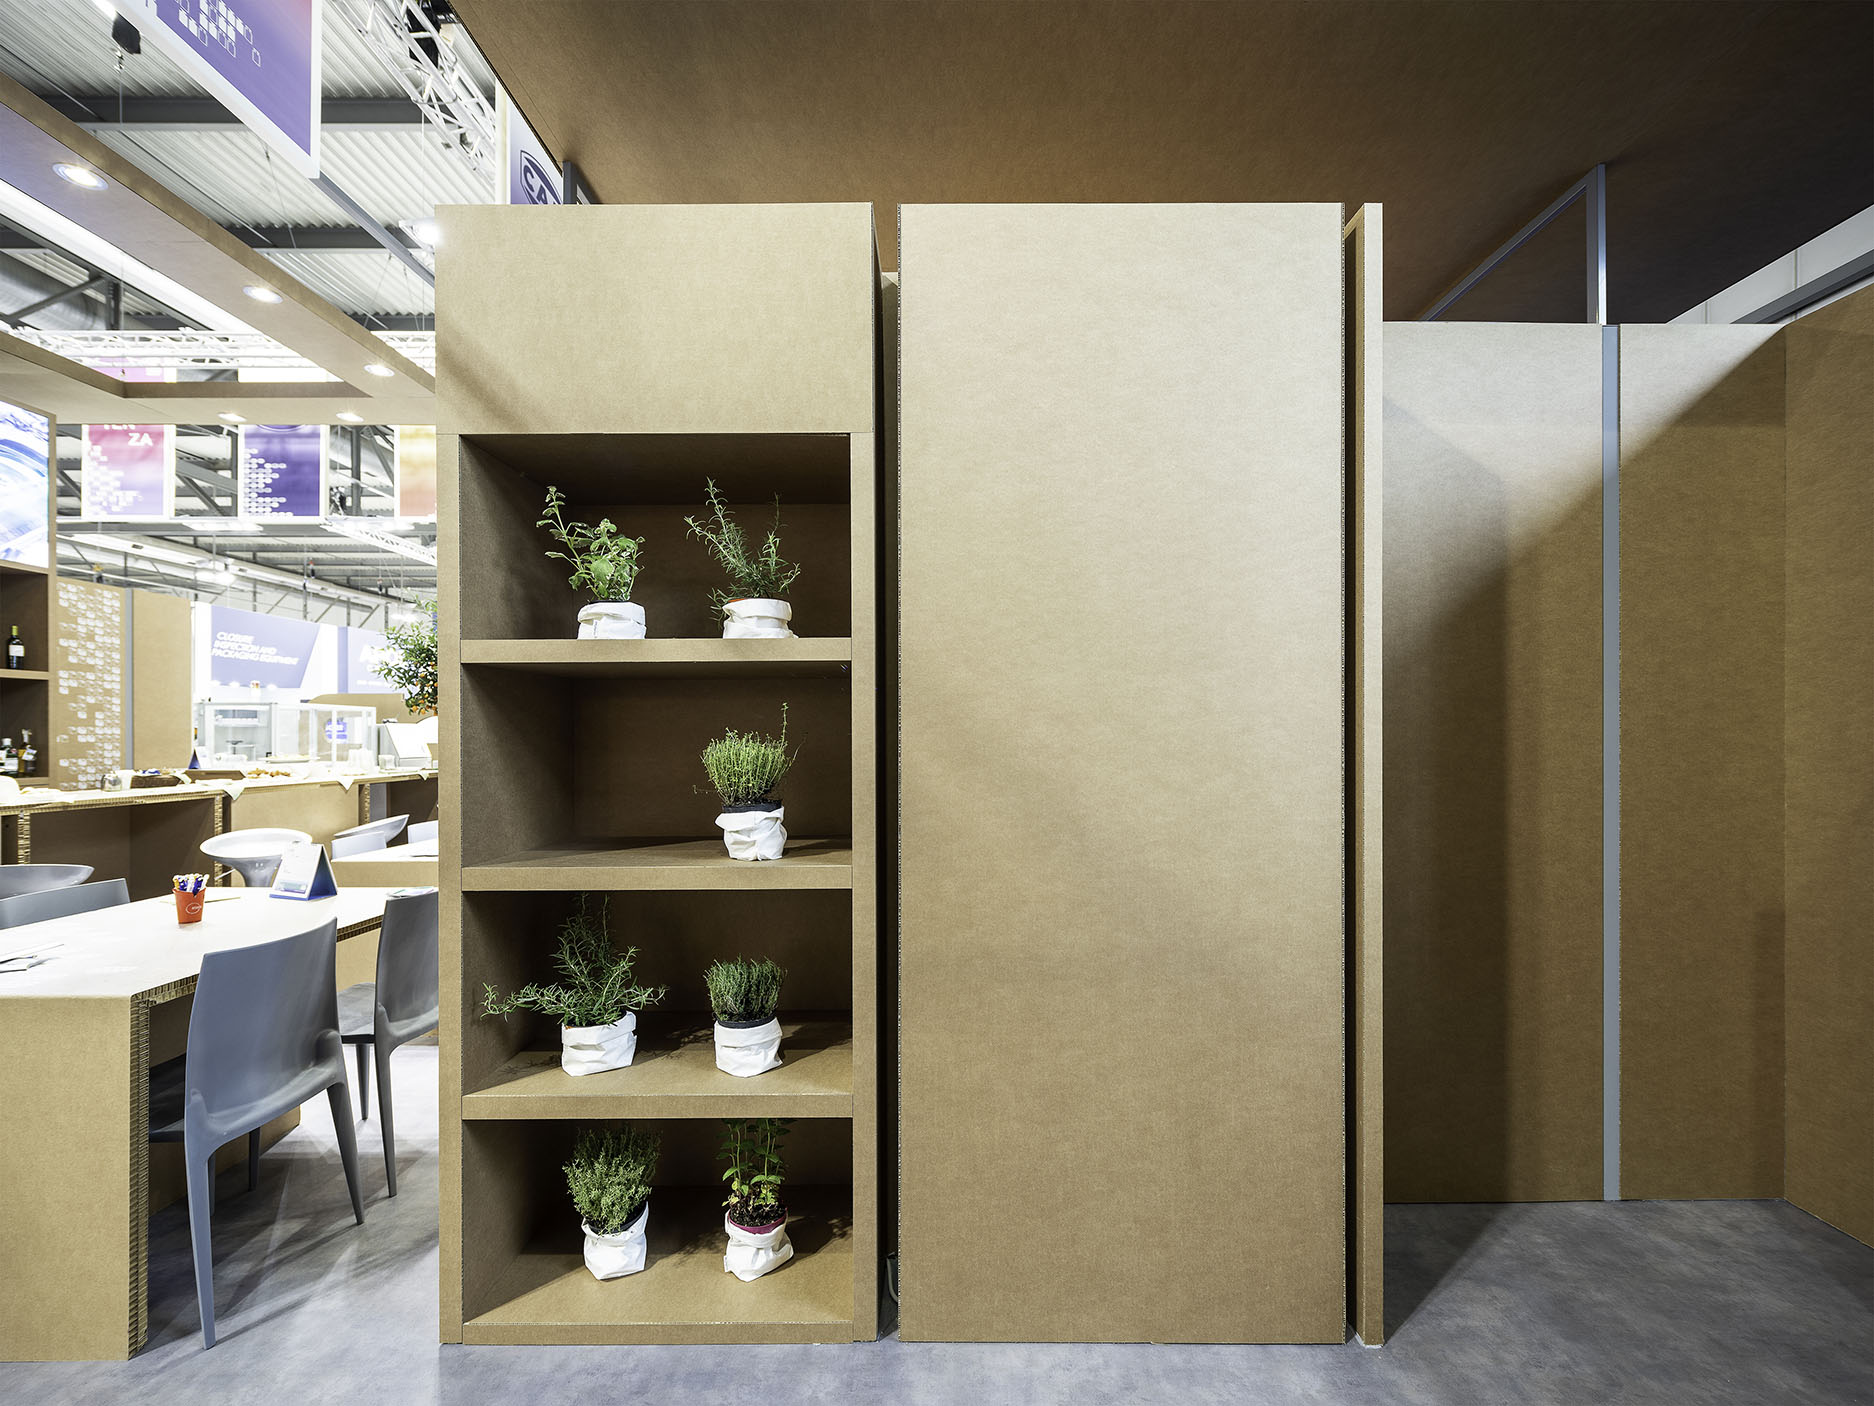 Detail _Modular Shelves - Cardboard Bearing Walls filippo poli